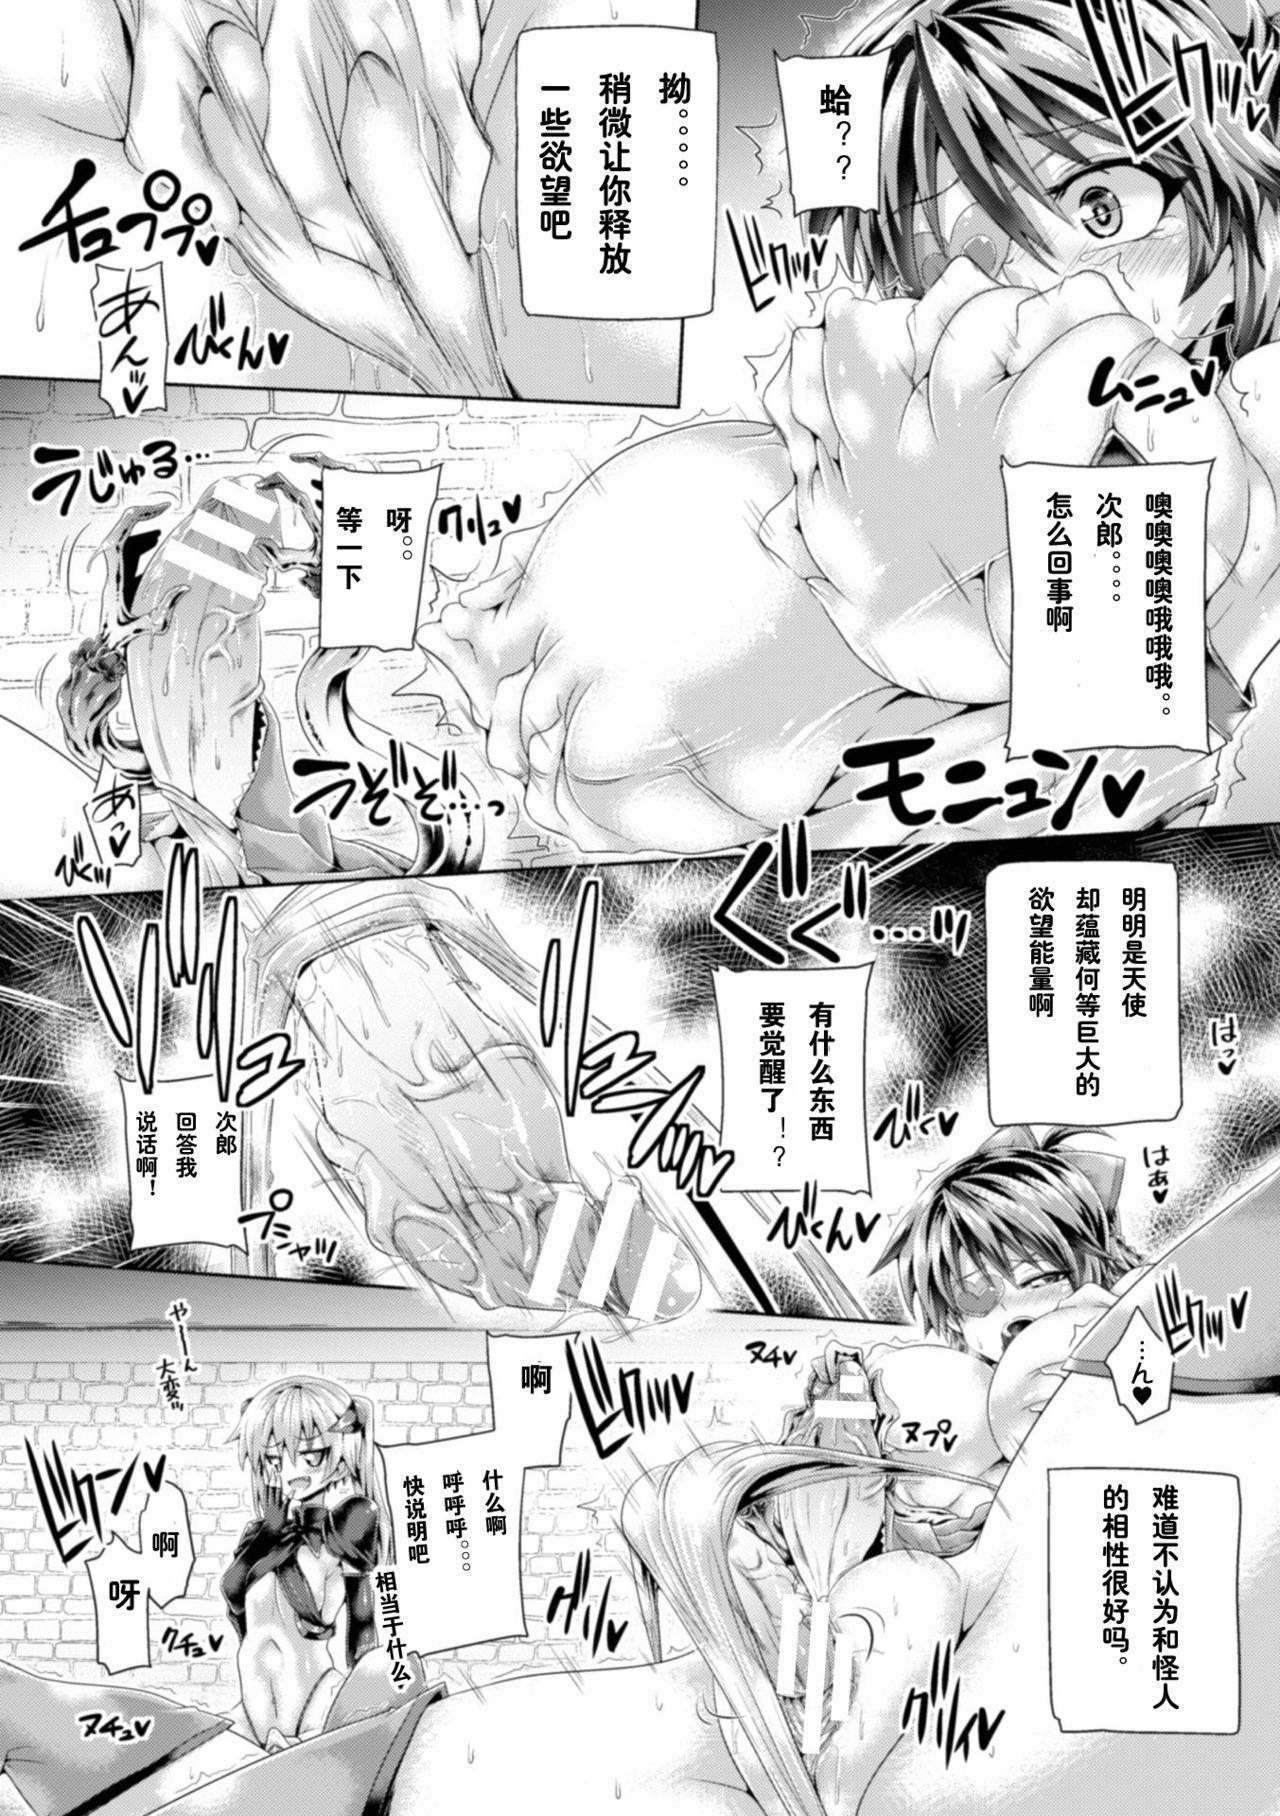 [Anthology] 2D Comic Magazine Tenshi ni Ochiru Akuma-tachi Vol. 1 Ch. 1-2 [Chinese] [这很恶堕汉化组] [Digital] 35